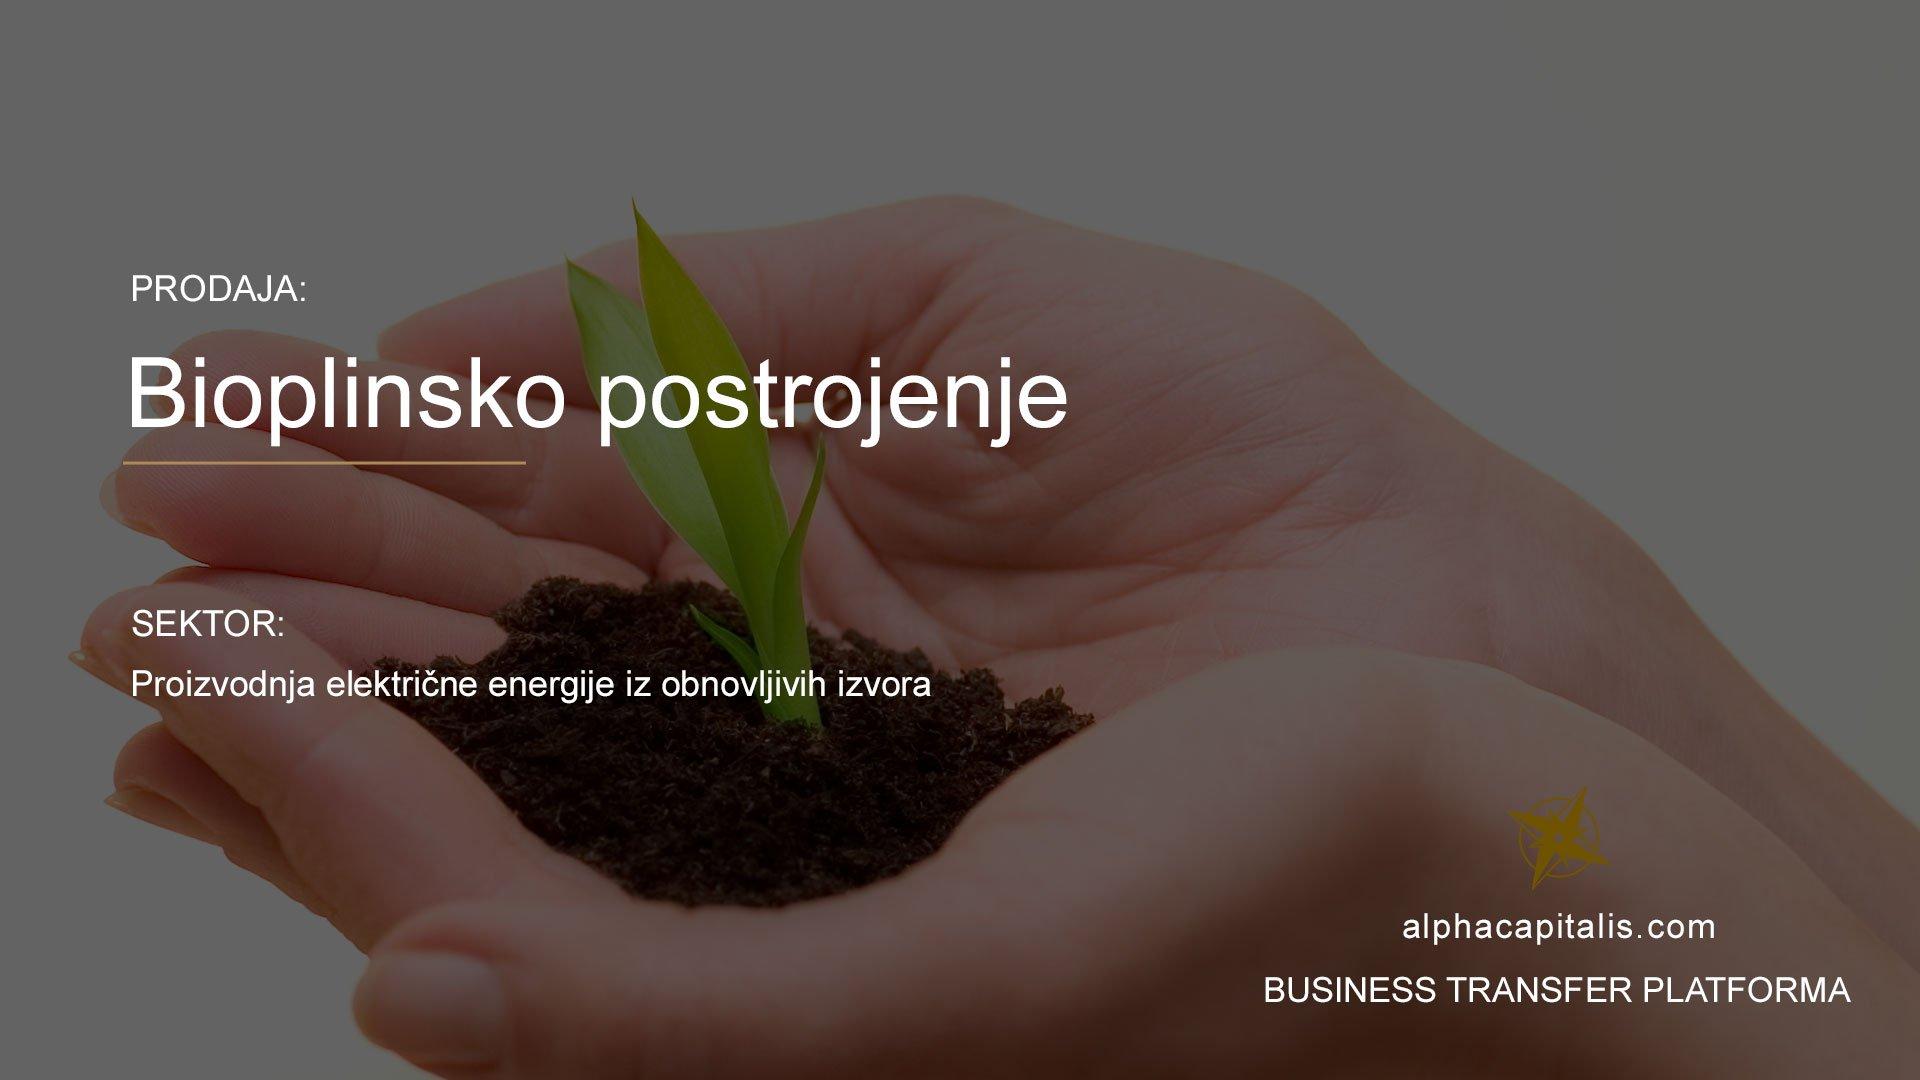 Alpha-Capitalis--Business-Transfer-Platforma_bioplinsko postrojenje